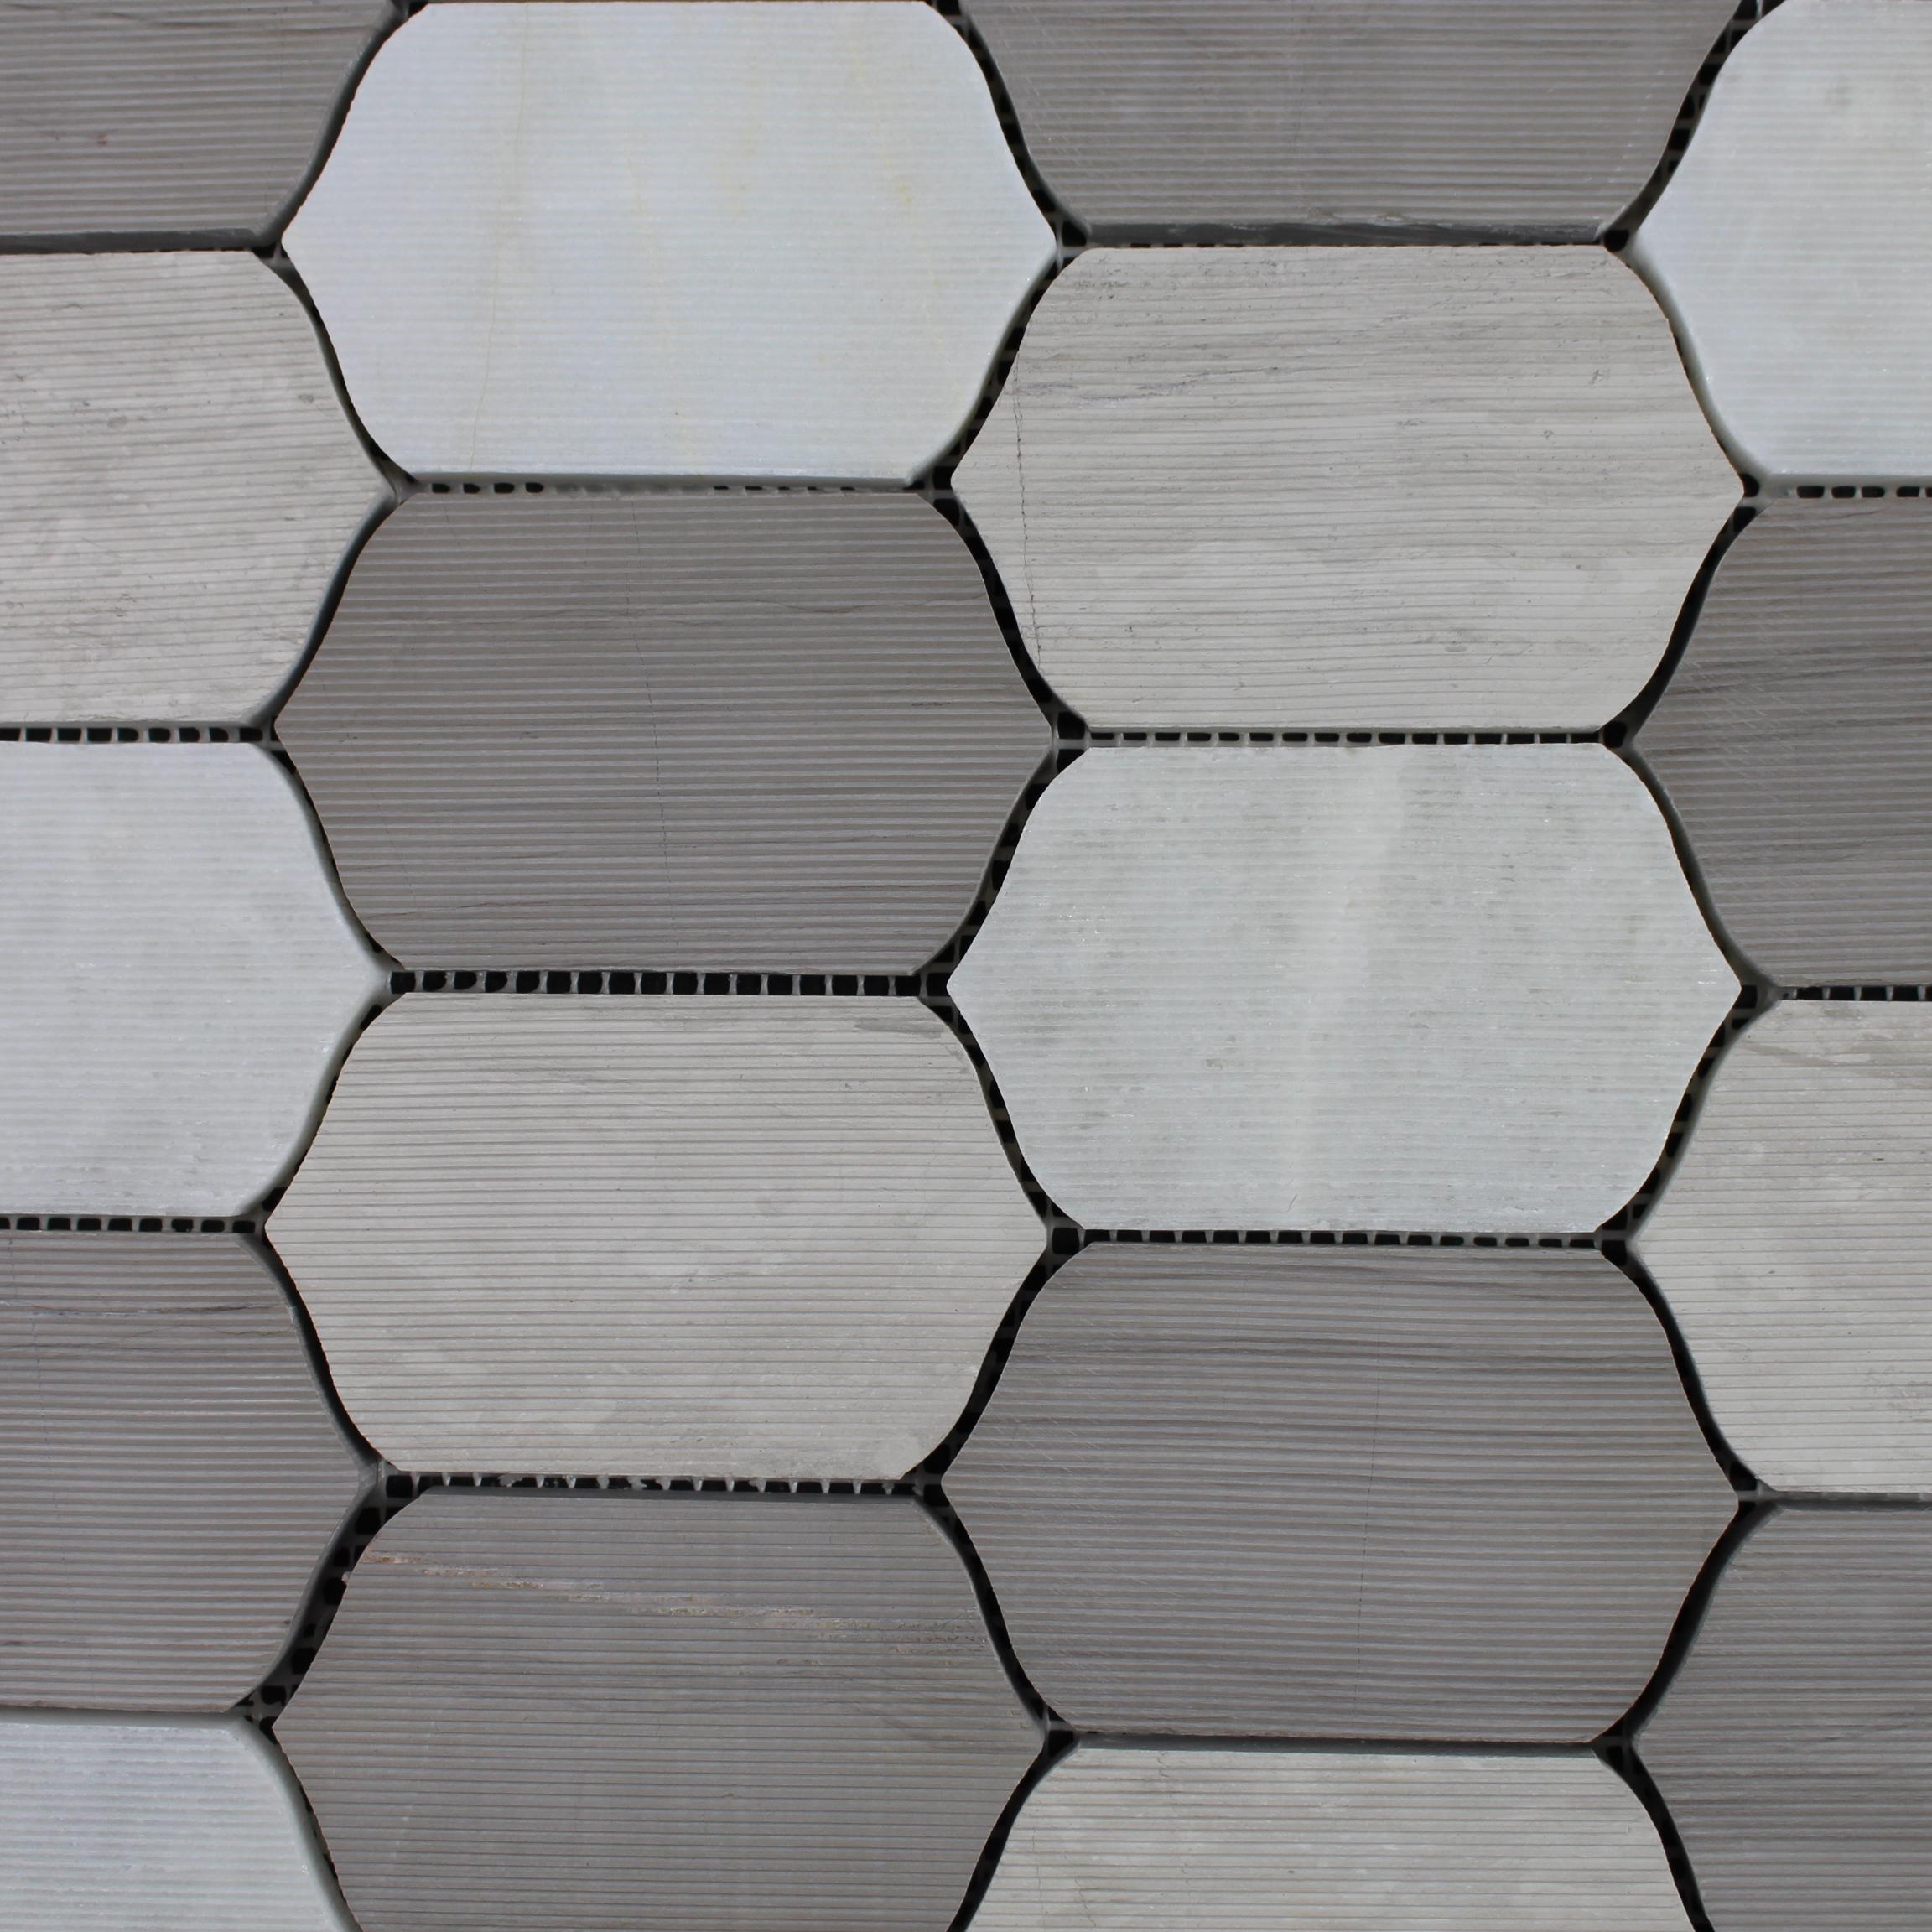 Honeycomb tile flooring - aunt-sue.info